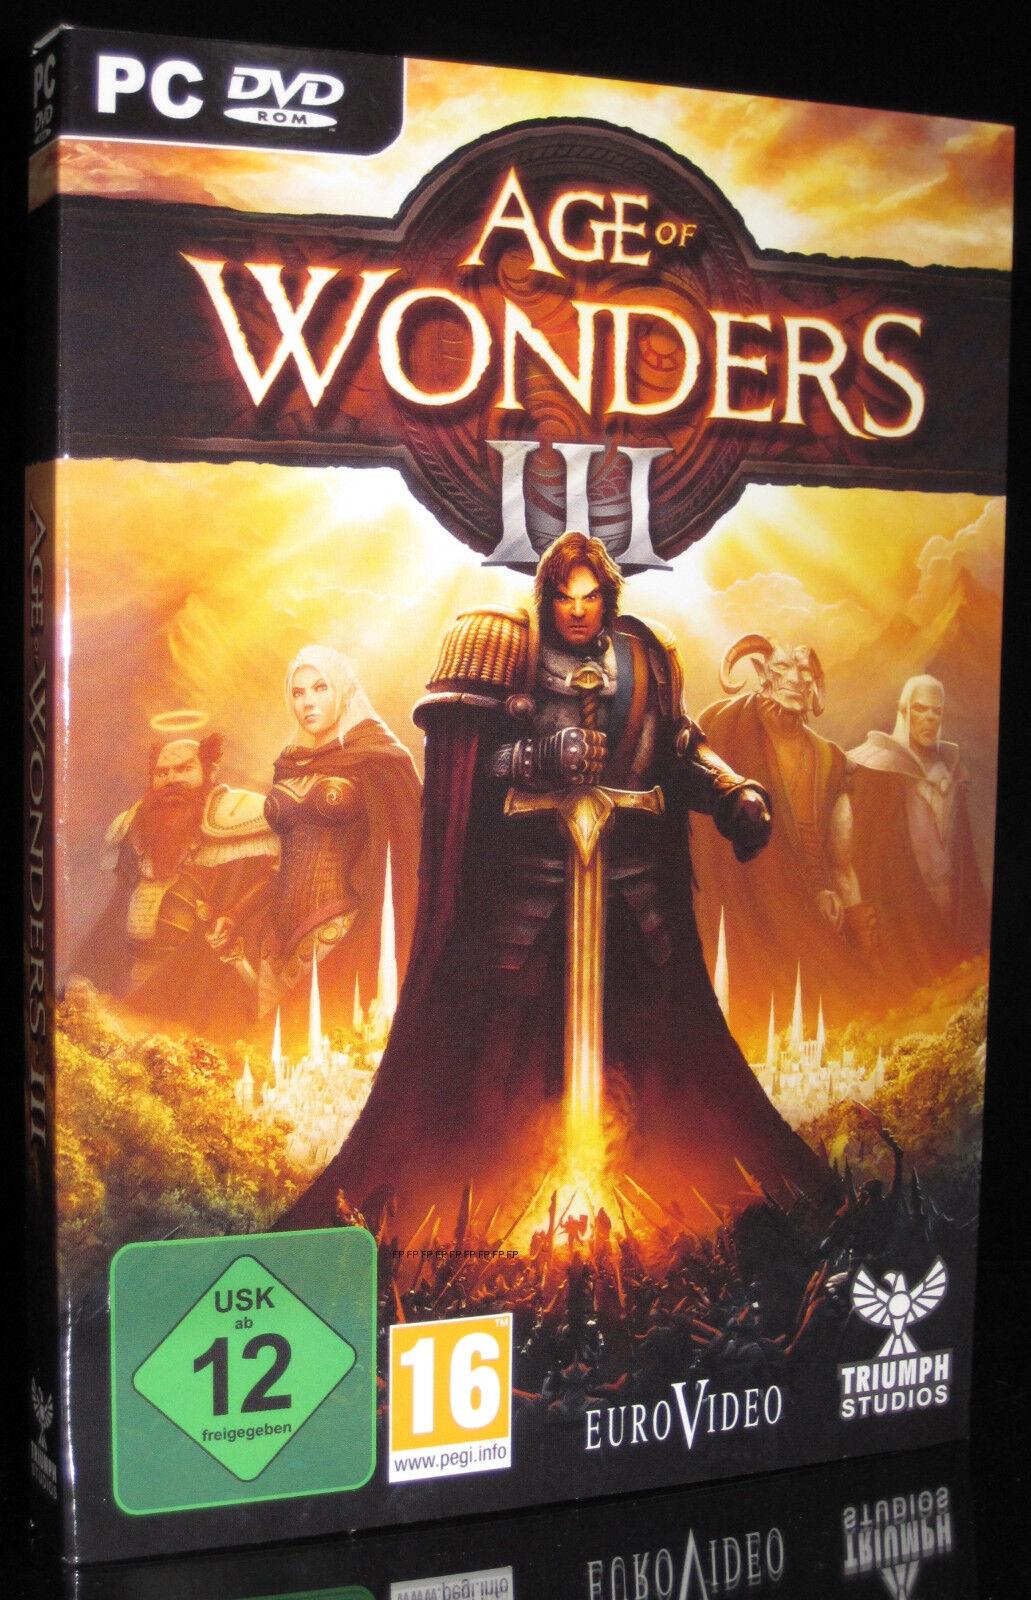 PC DVD-ROM AGE OF WONDERS 3 - TOP Fantasy + Strategie-Rollenspiel *** NEU ***